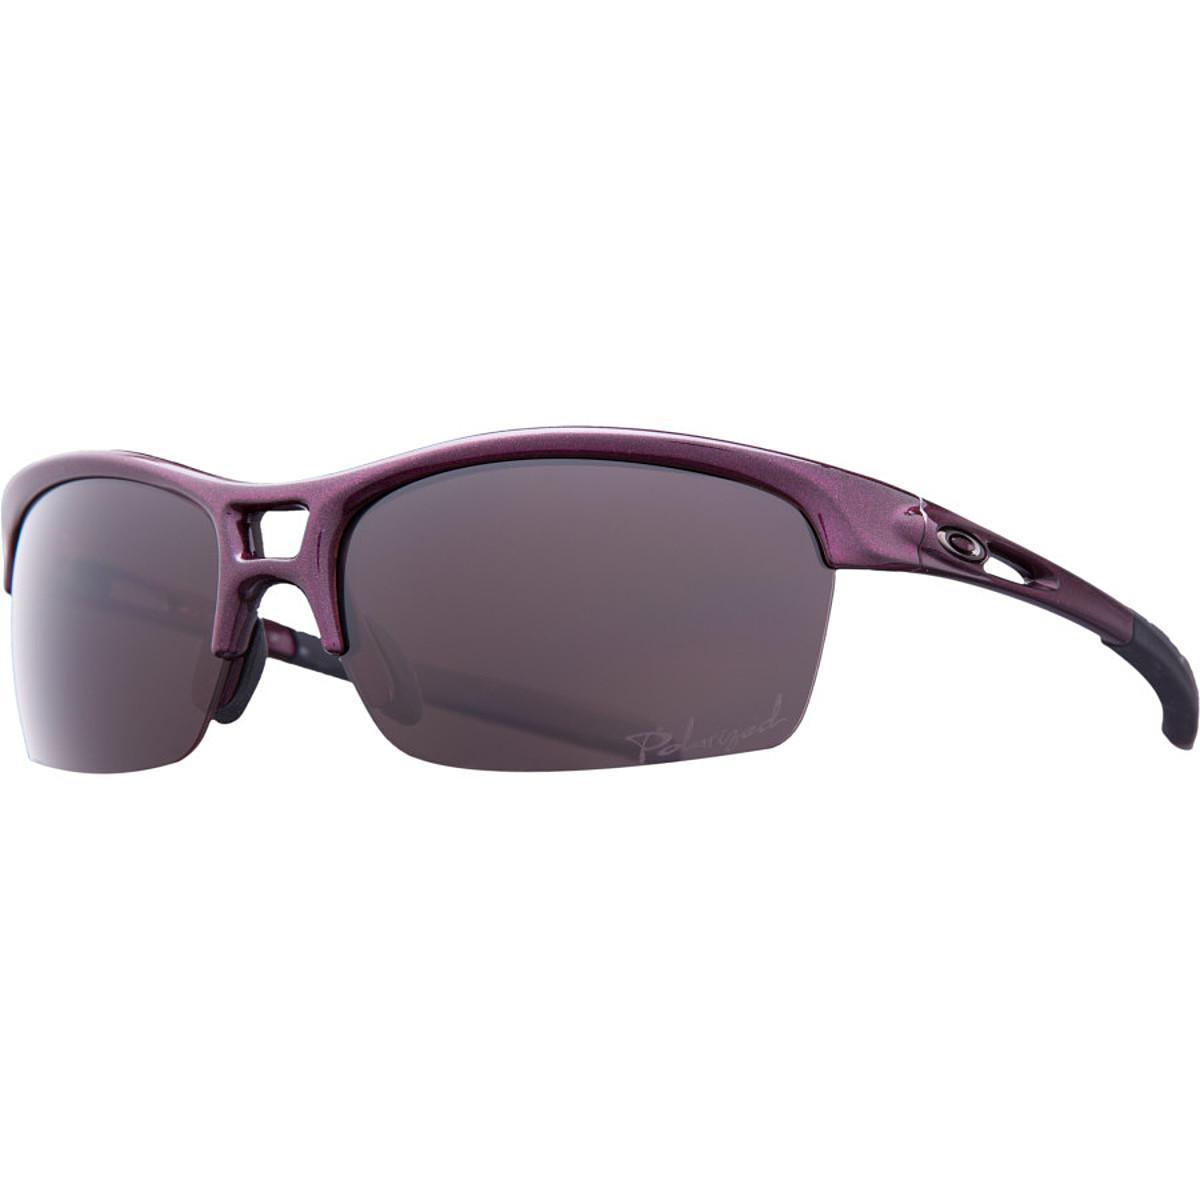 oakley rpm polarized sunglasses - women's